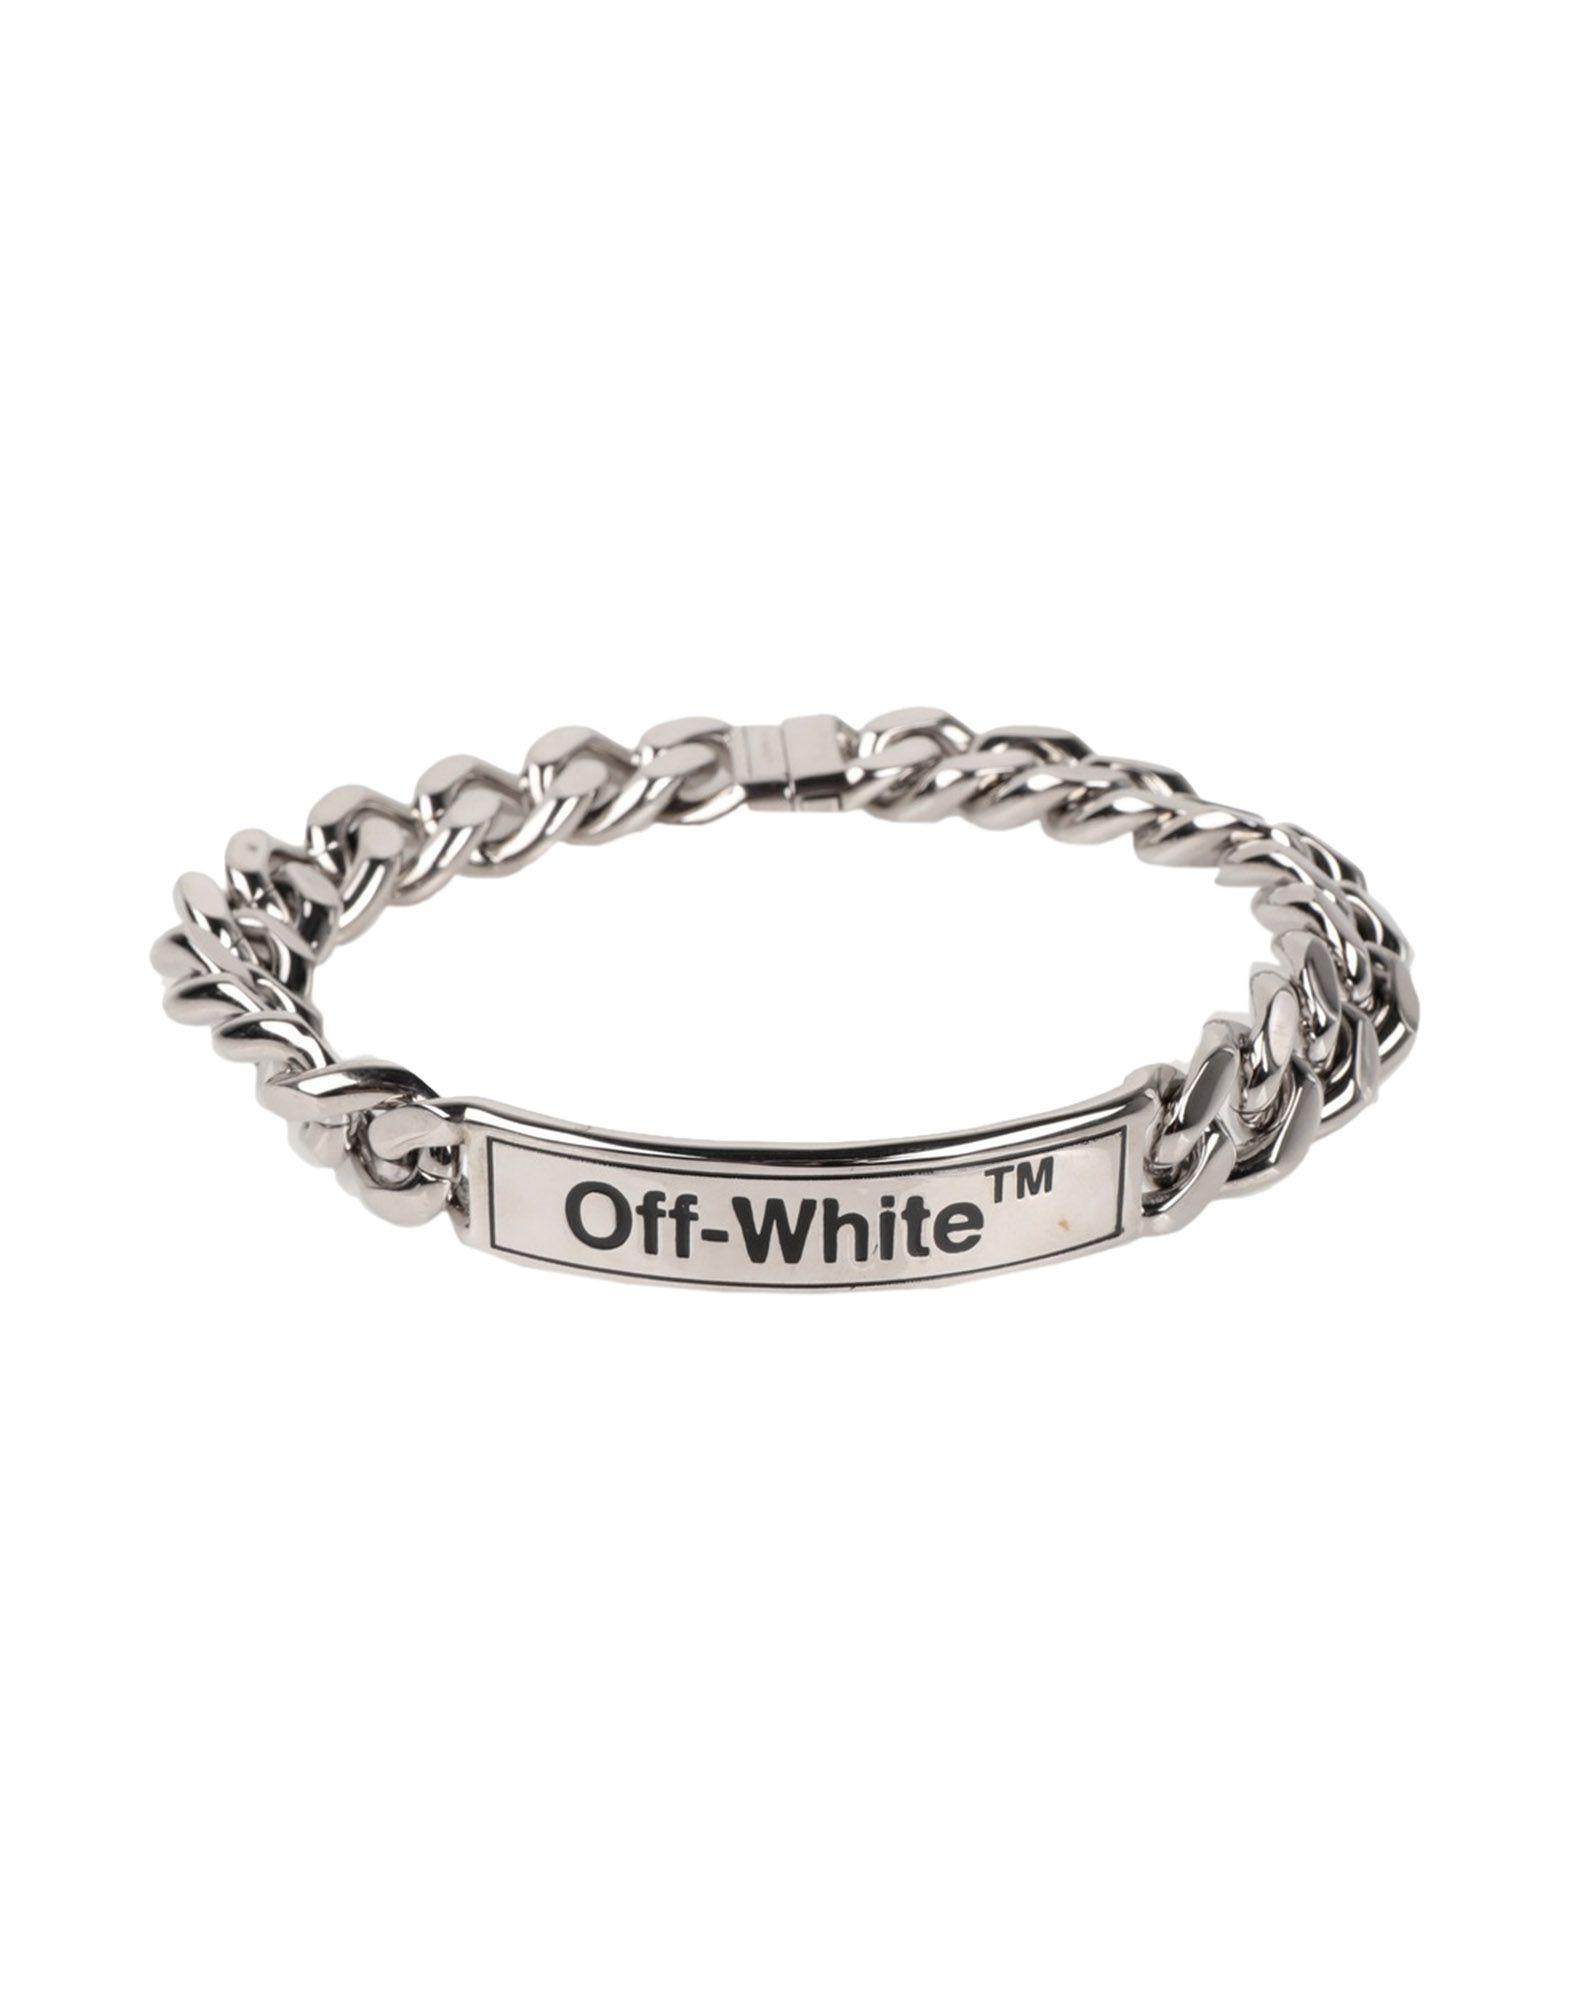 OFF-WHITE™ Bracelets. logo, pointelle-knit. 100% Metal